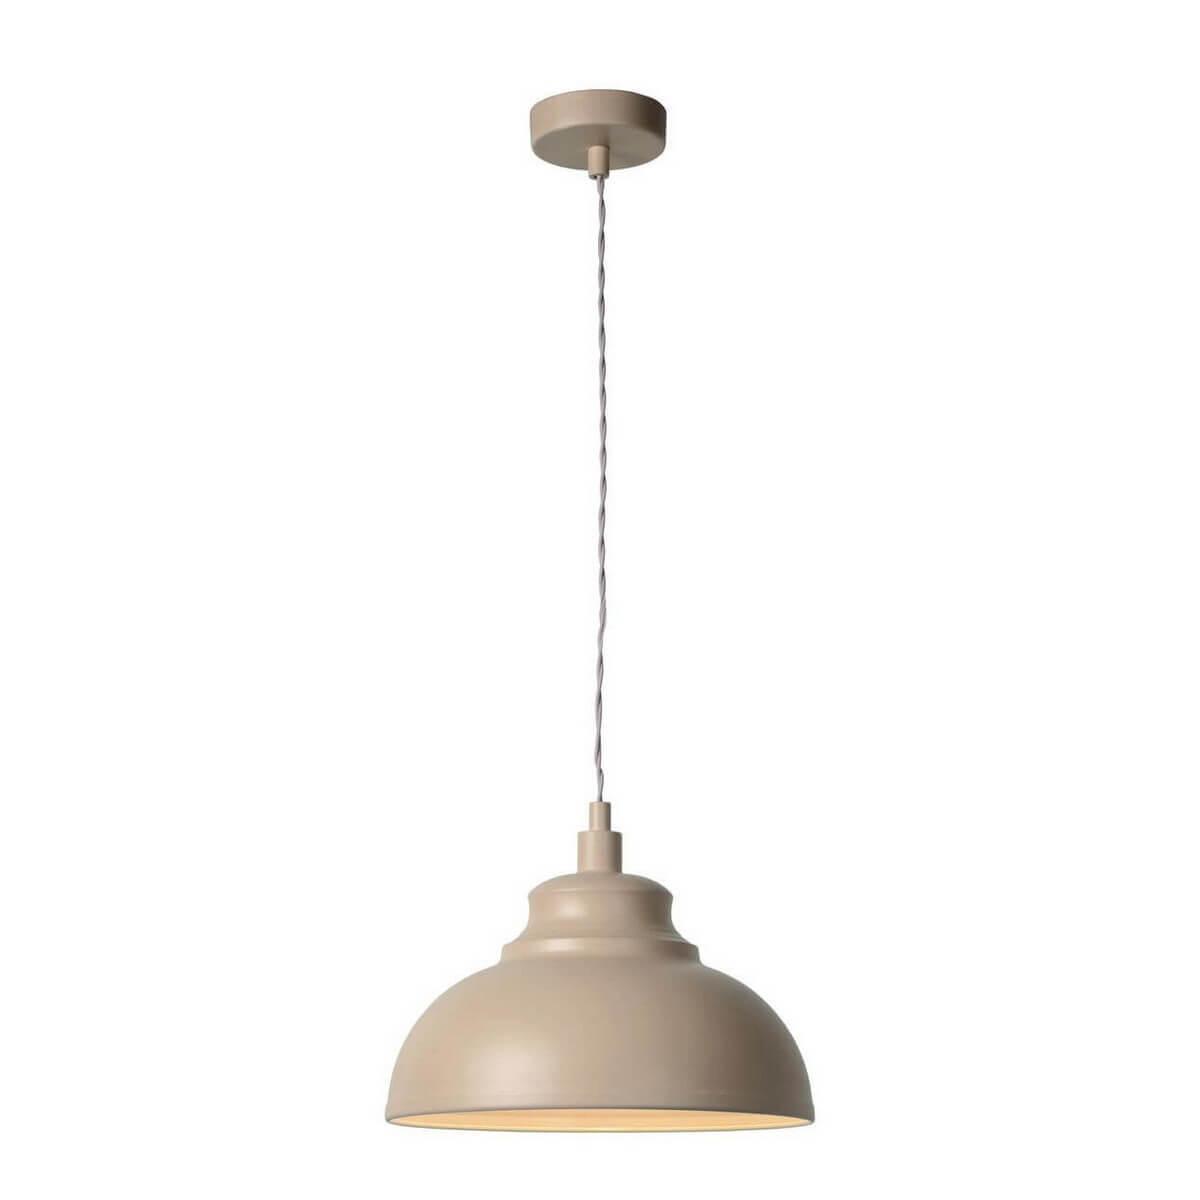 Подвесной светильник Lucide Isla 34400/29/41 цена и фото